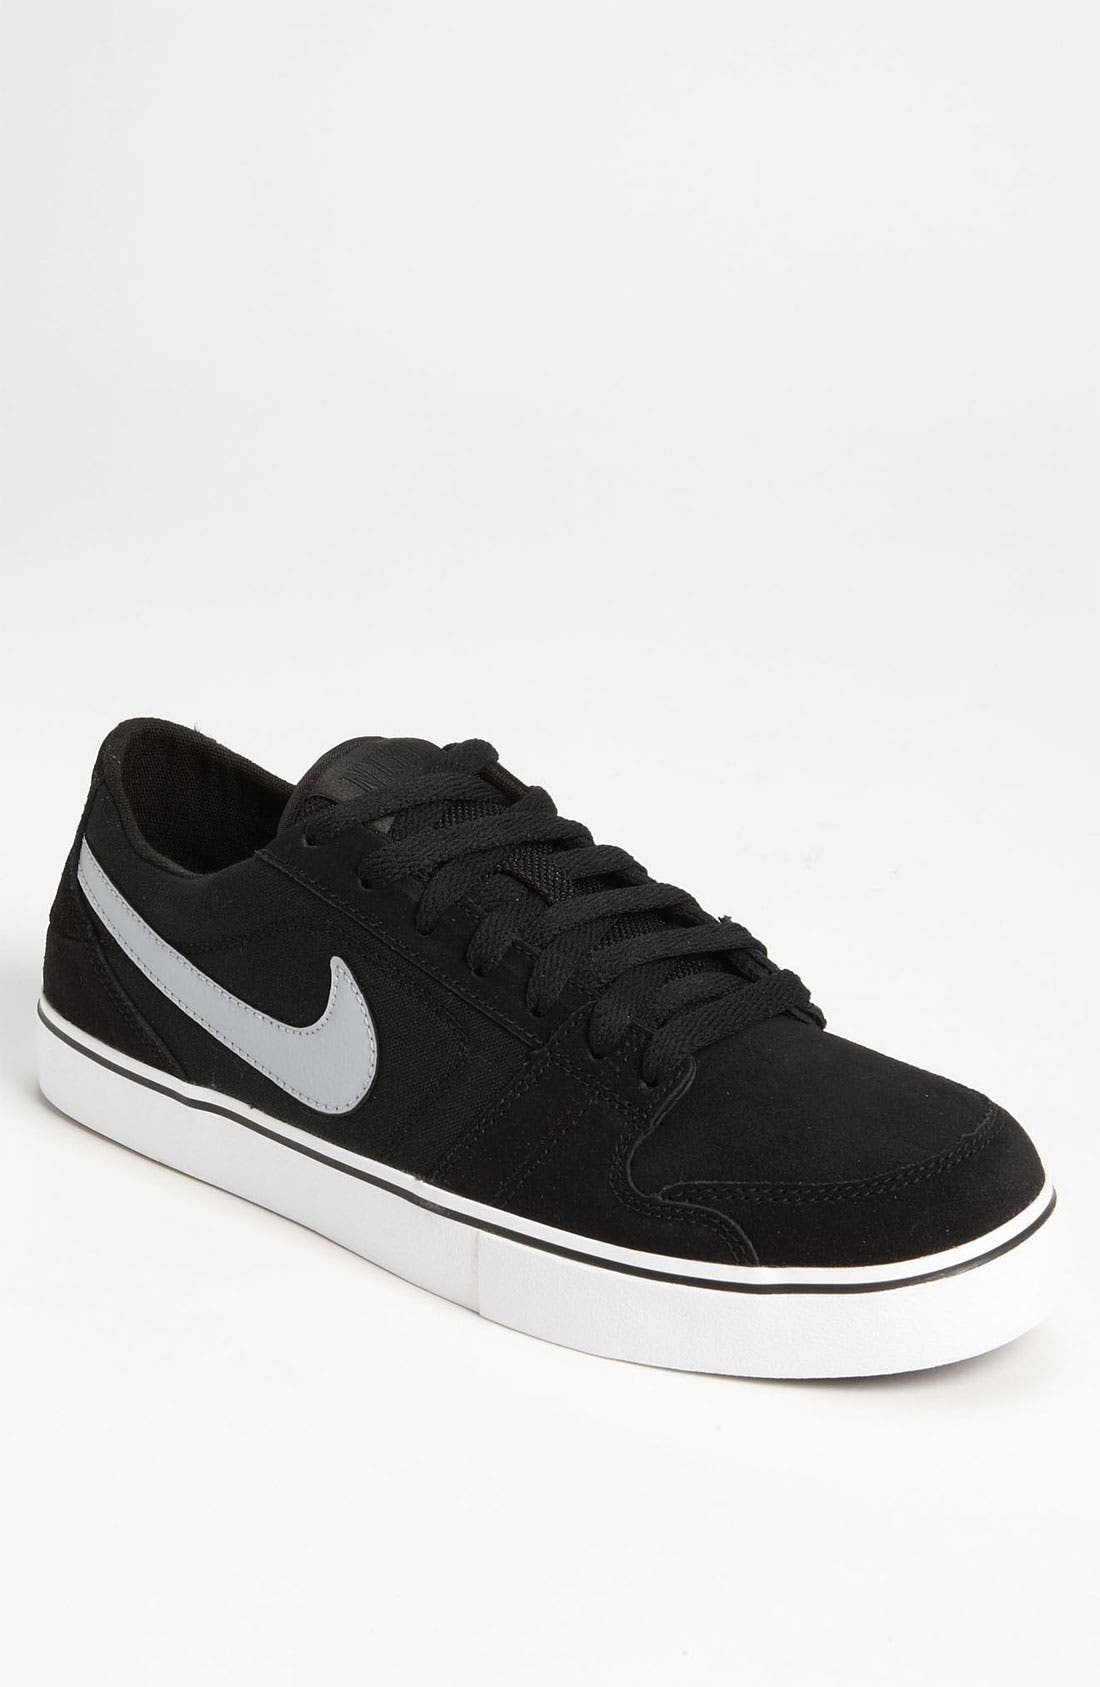 Alternate Image 1 Selected - Nike 'Ruckus LR' Sneaker (Men) (Online Only)